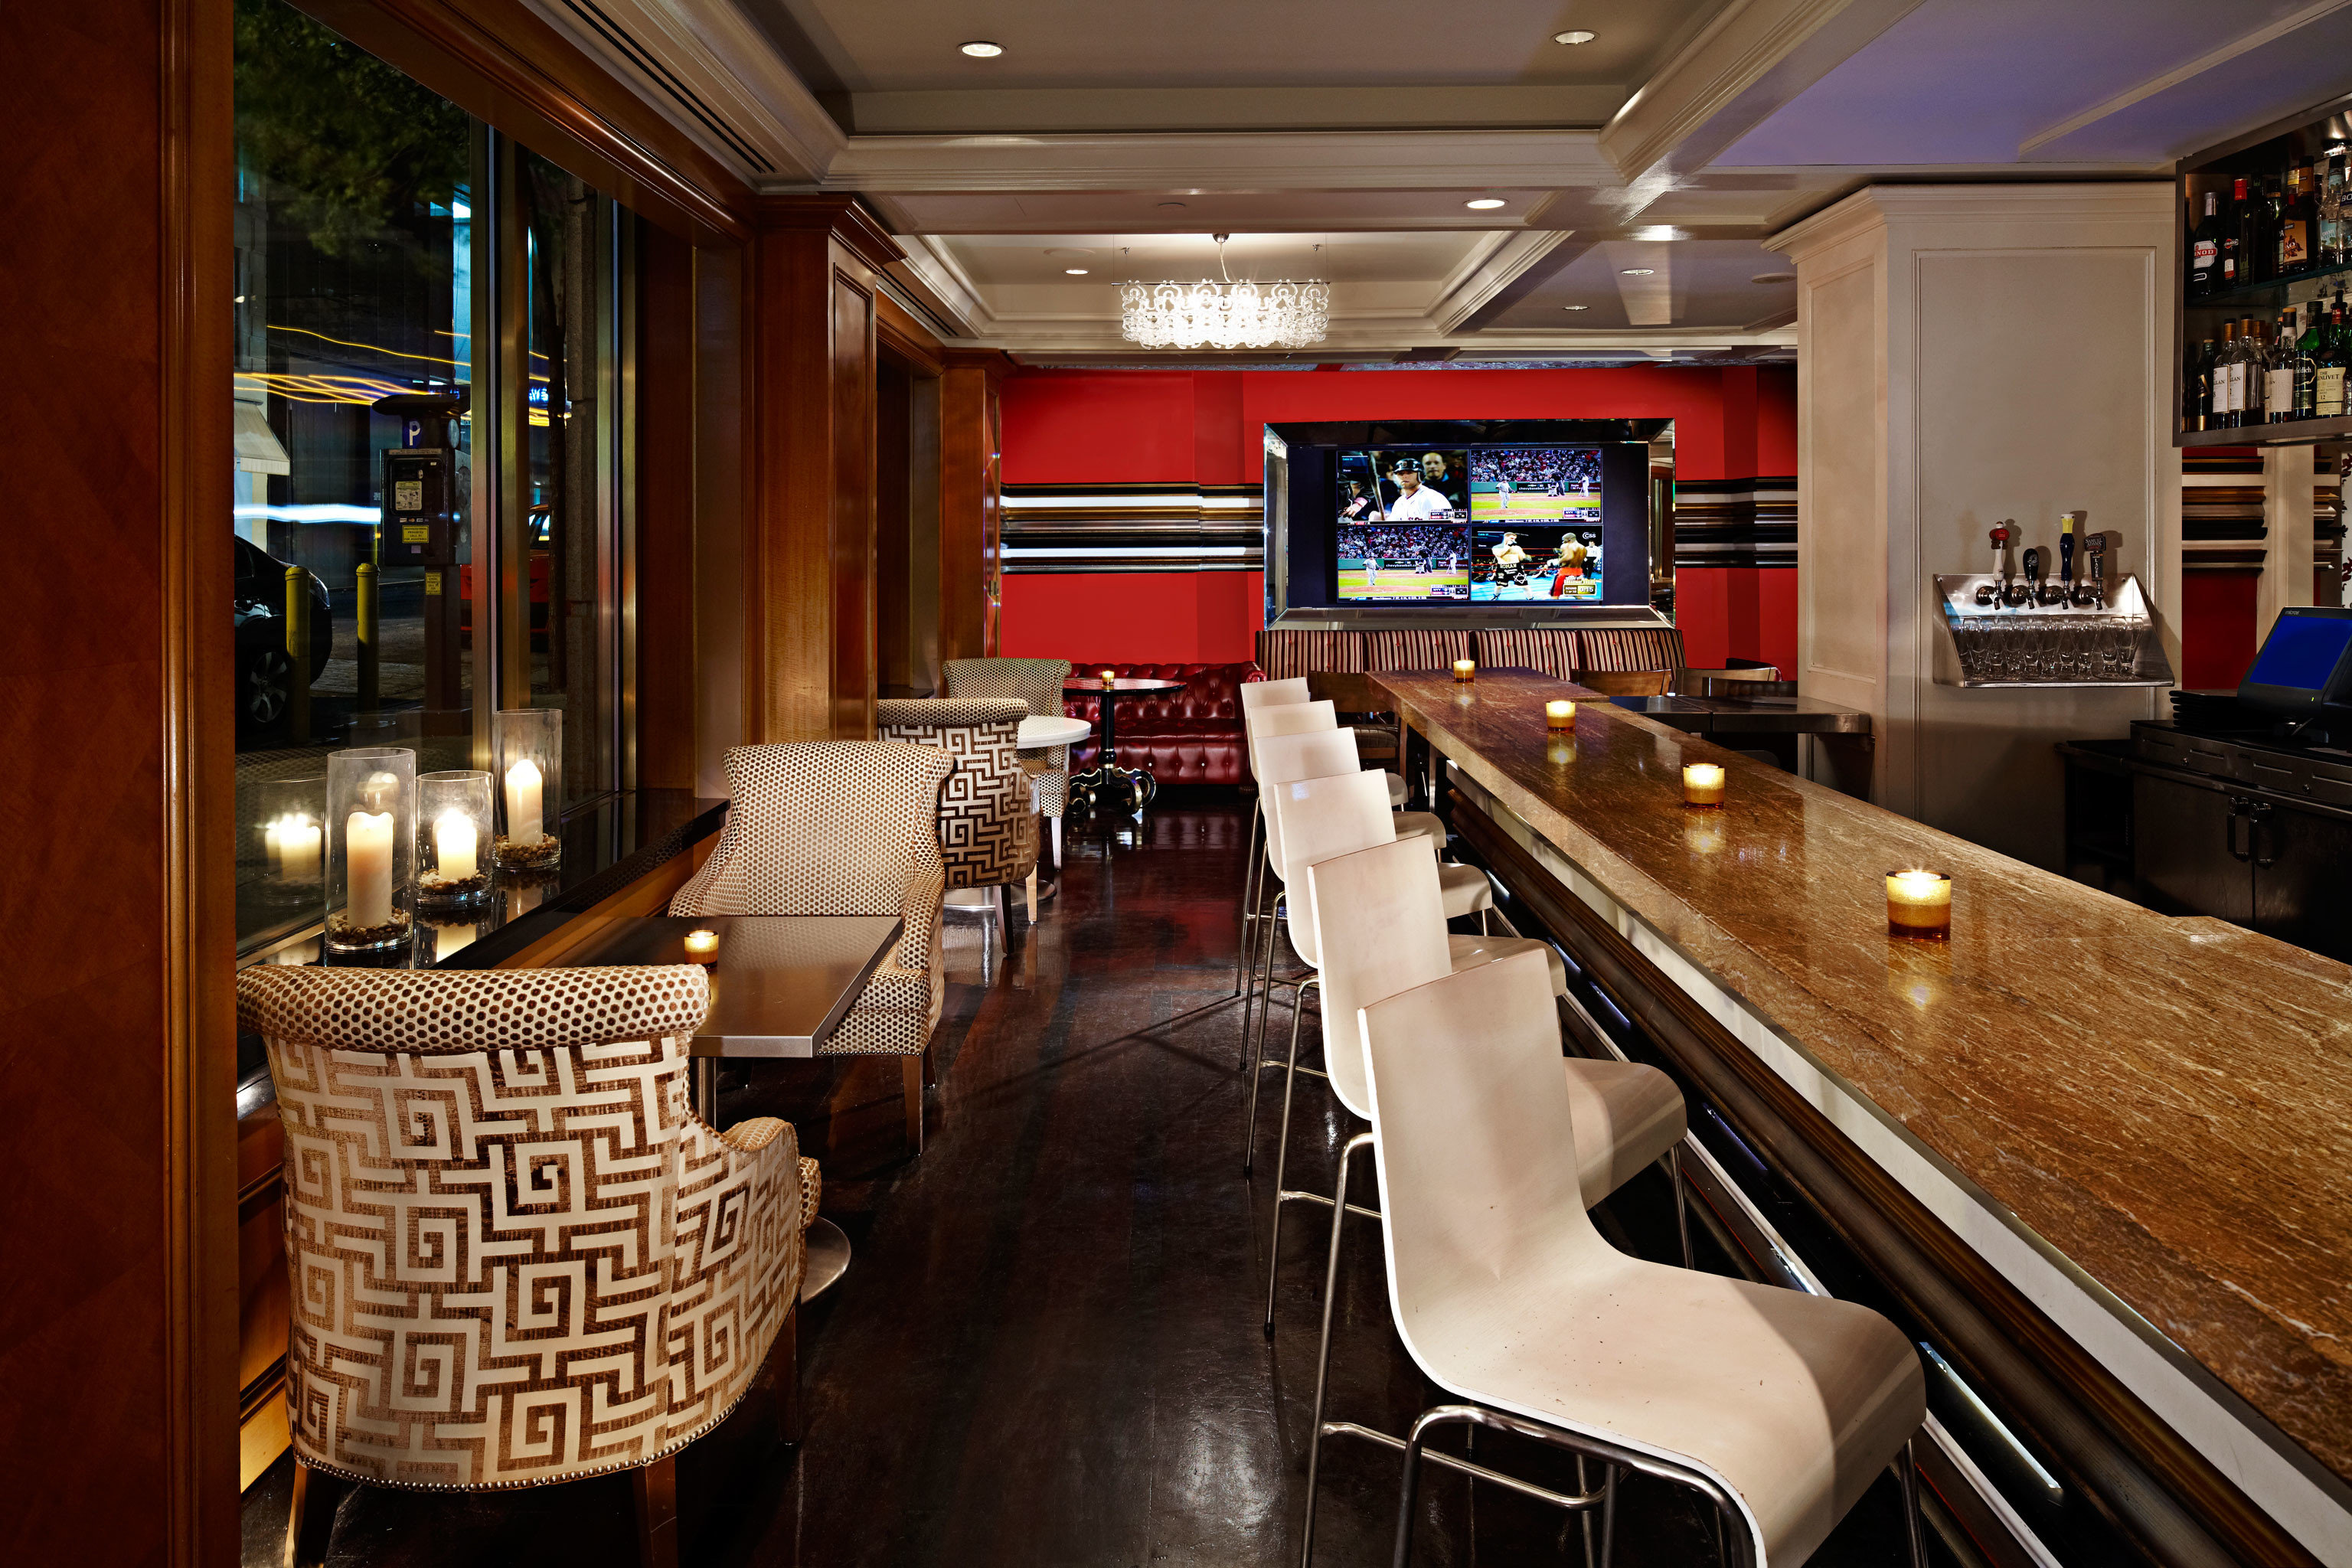 Bar Dining Drink Eat Luxury Modern recreation room billiard room restaurant home dining table